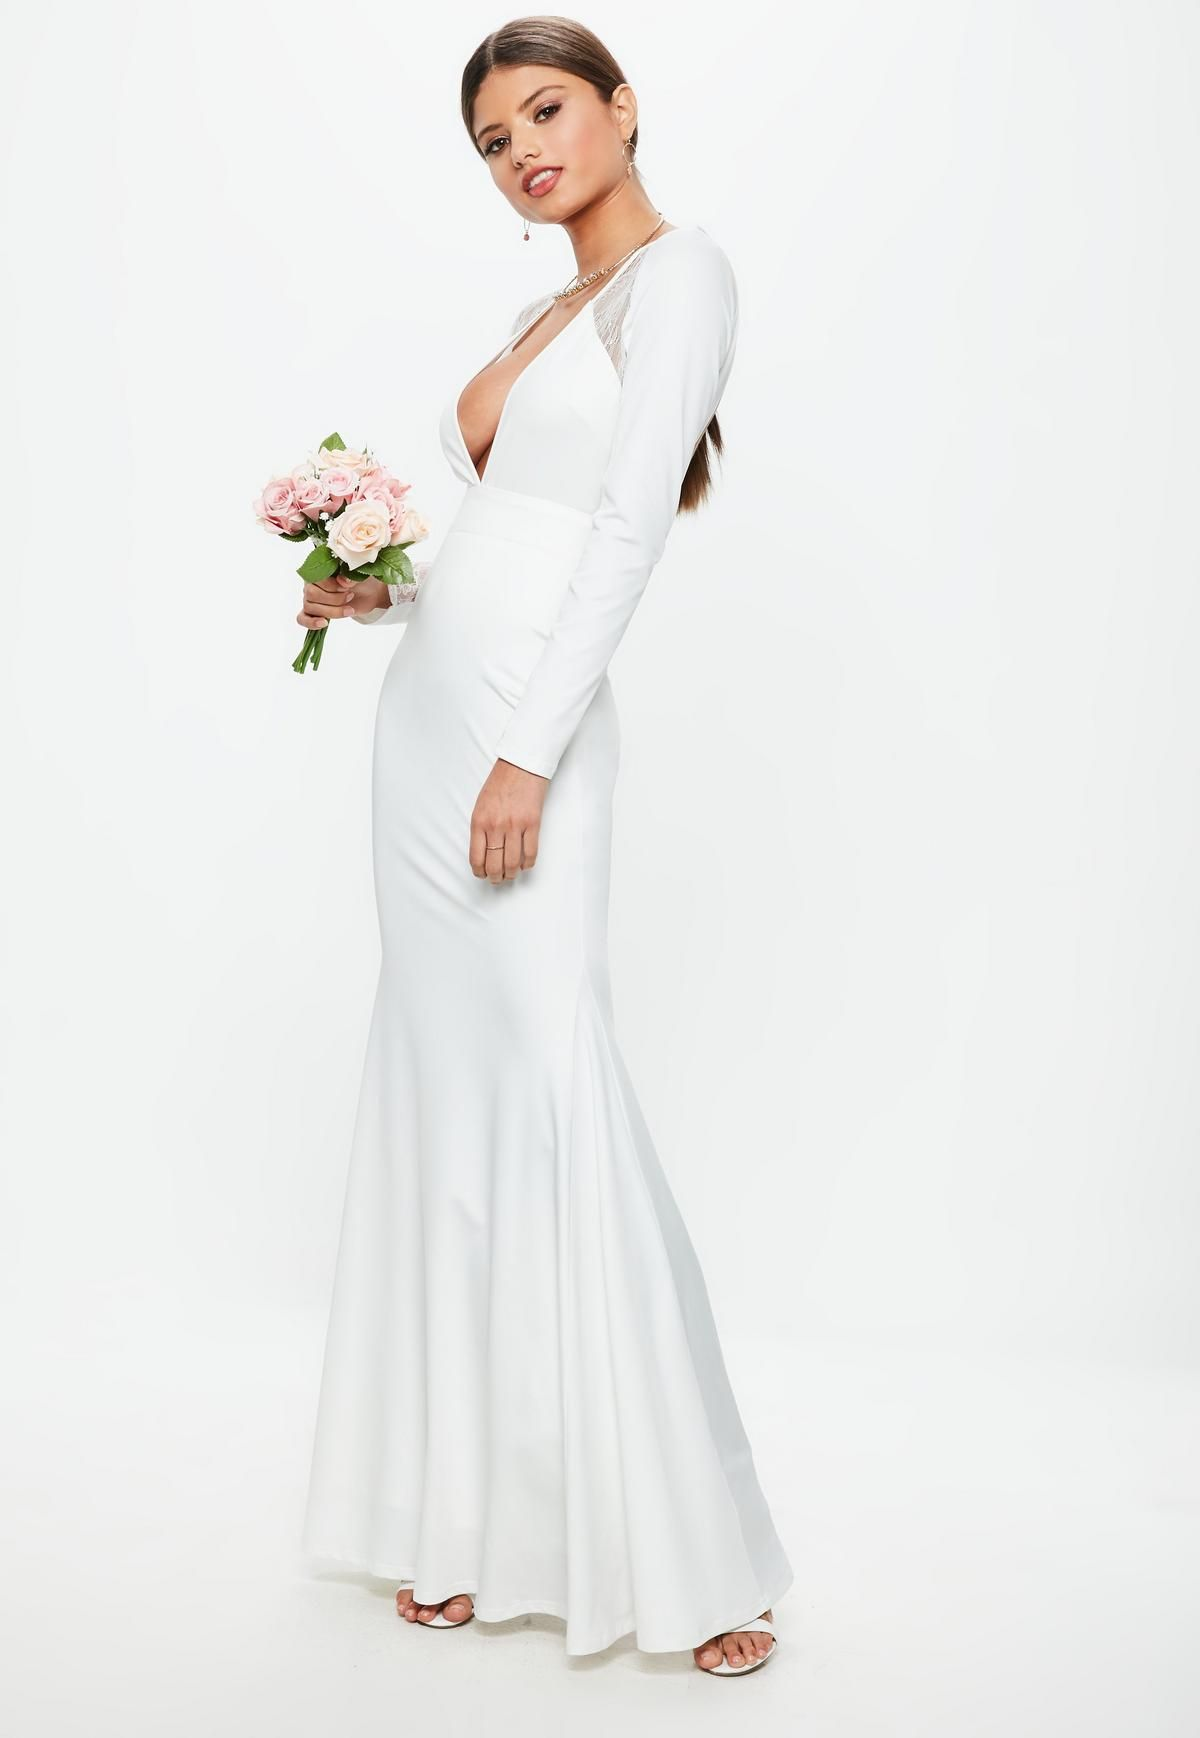 ac4d7c2da3 Bridal White Long Sleeve Plunge Open Back Lace Insert Maxi Dress ...